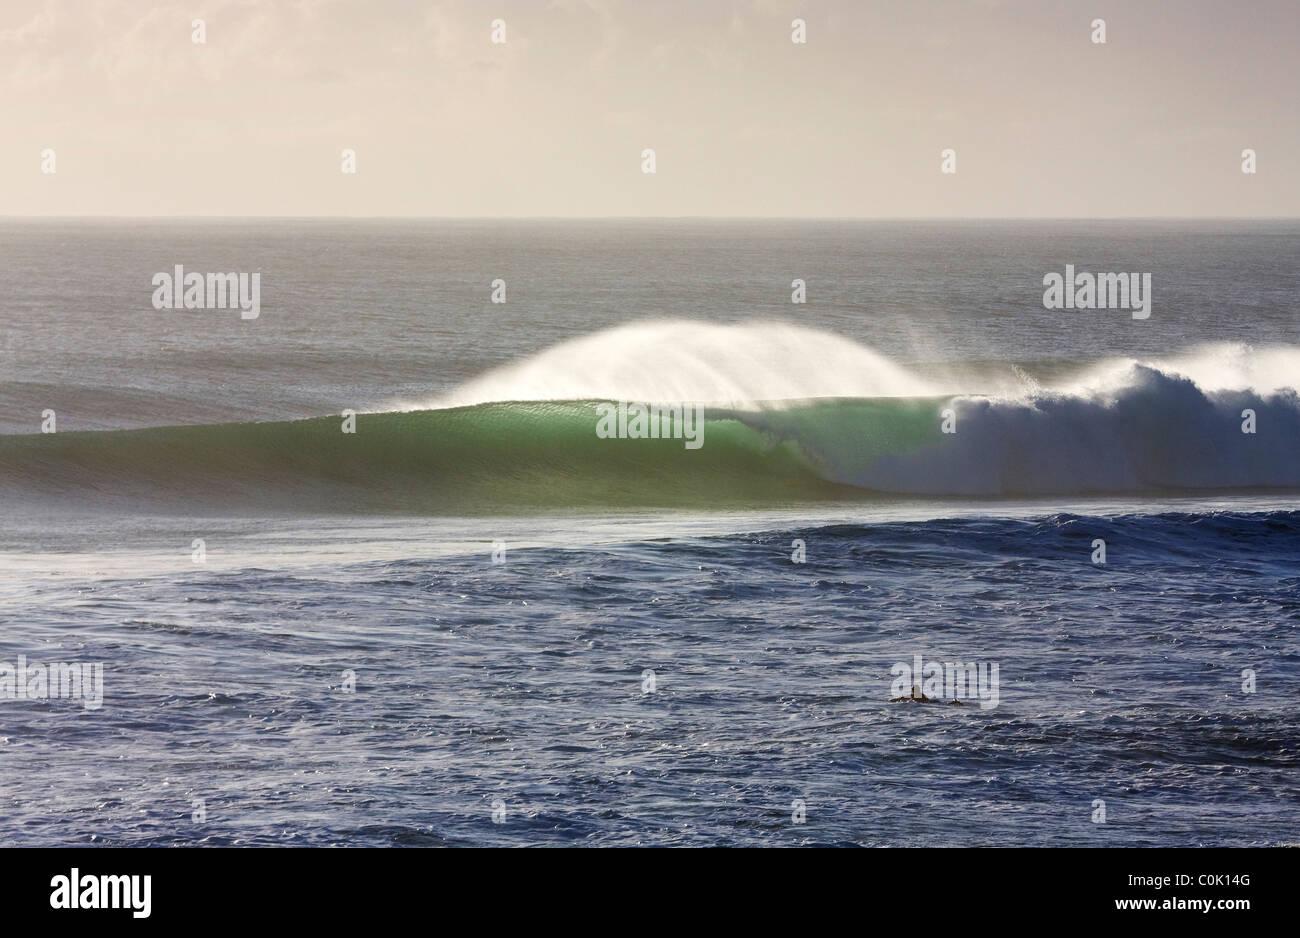 Early morning swell, Burleigh Heads Gold Coast Australia - Stock Image